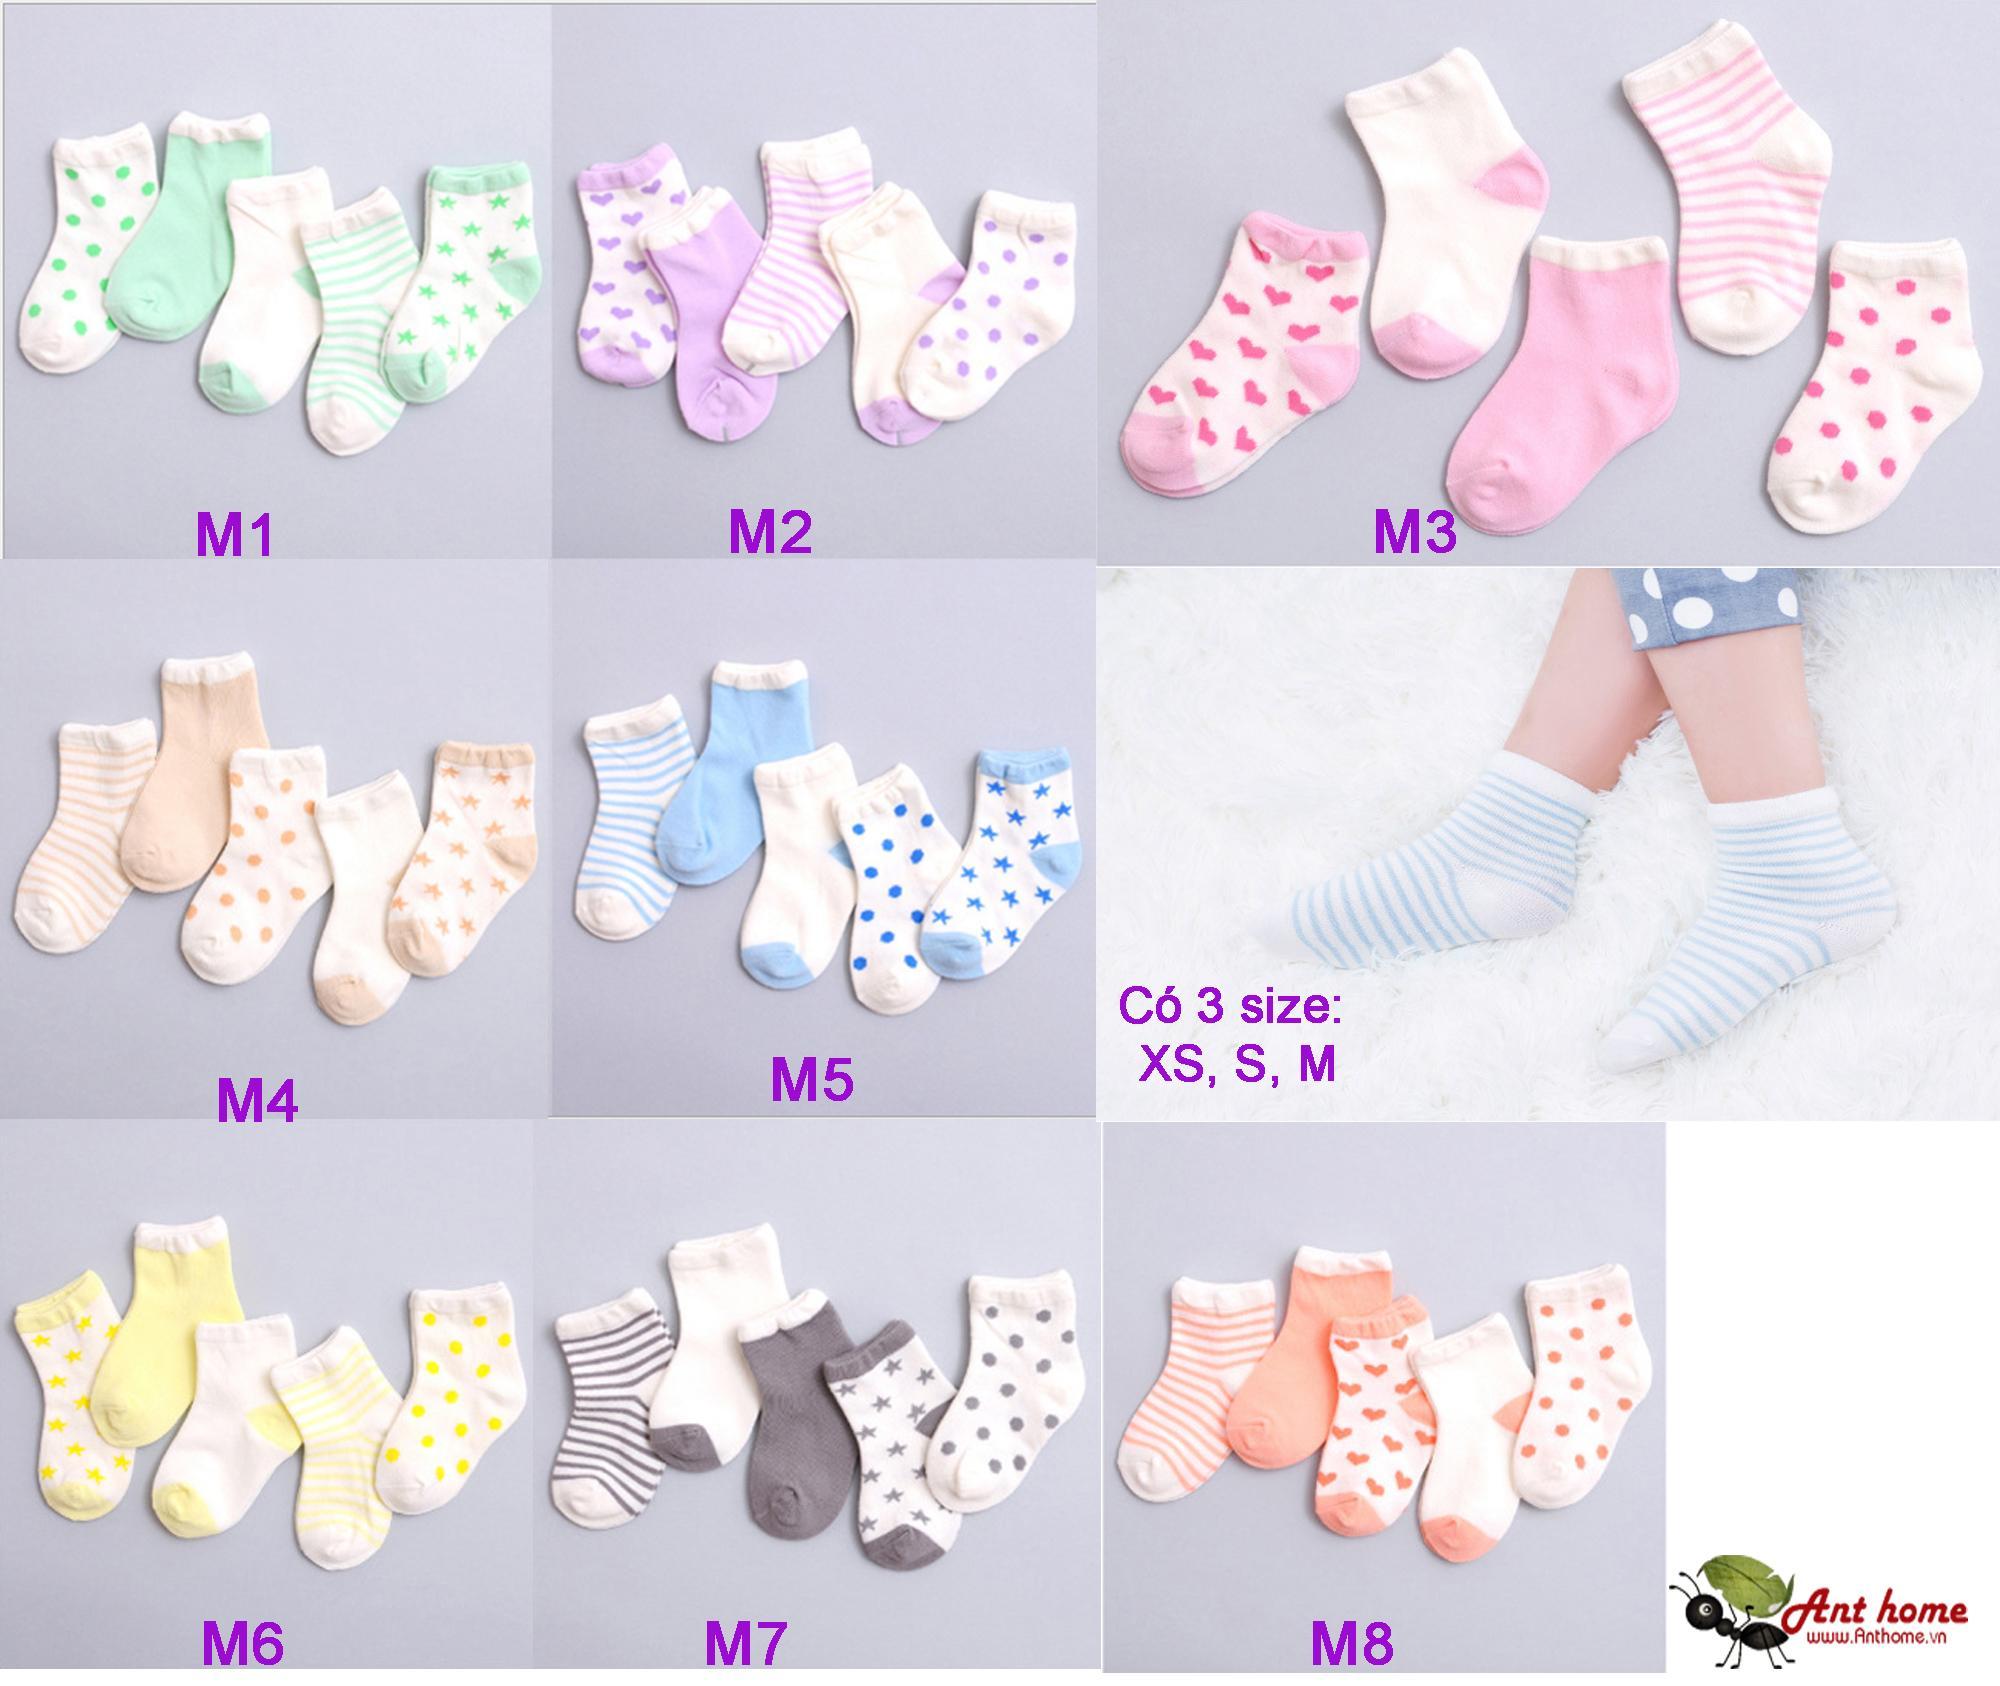 Combo 5 đôi vớ (tất) bé gái từ 0-1 tuổi size XS mẫu M2